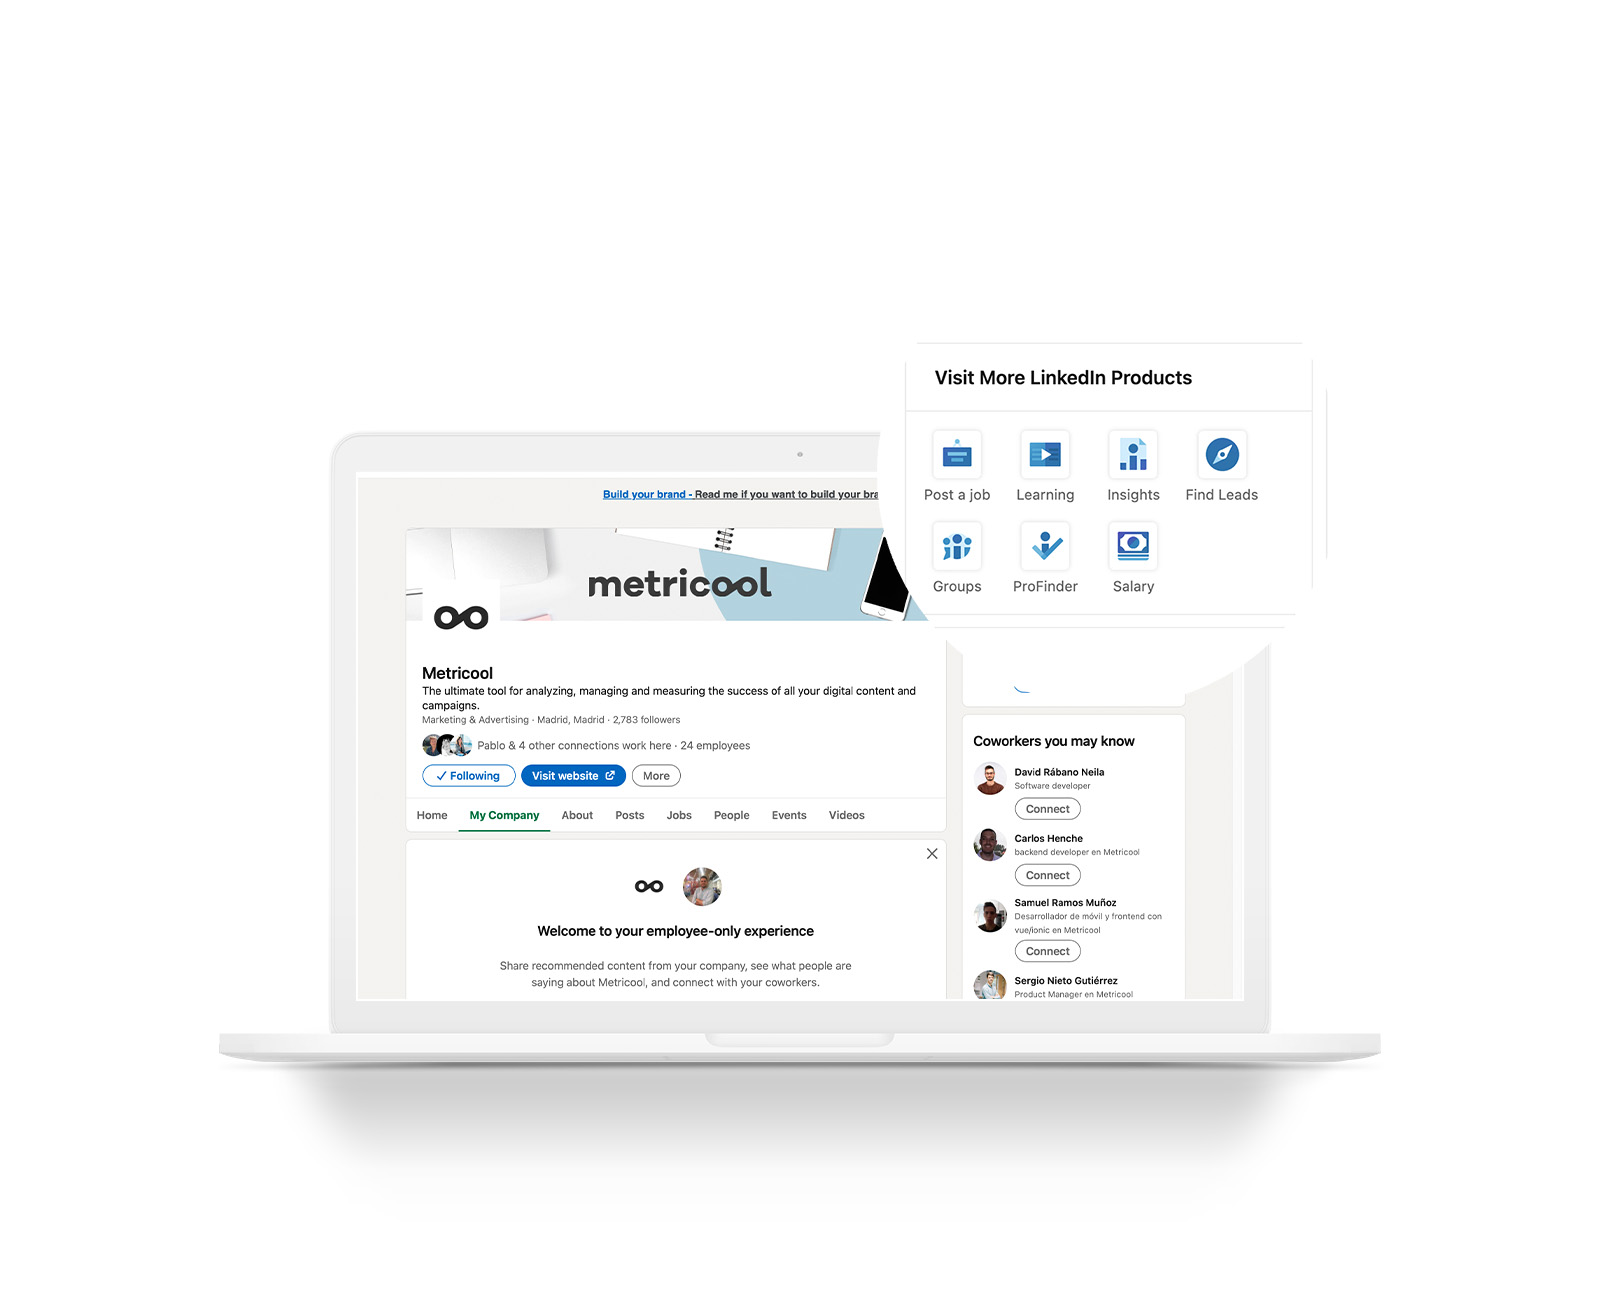 cómo publicar una oferta de empleo en LinkedIn